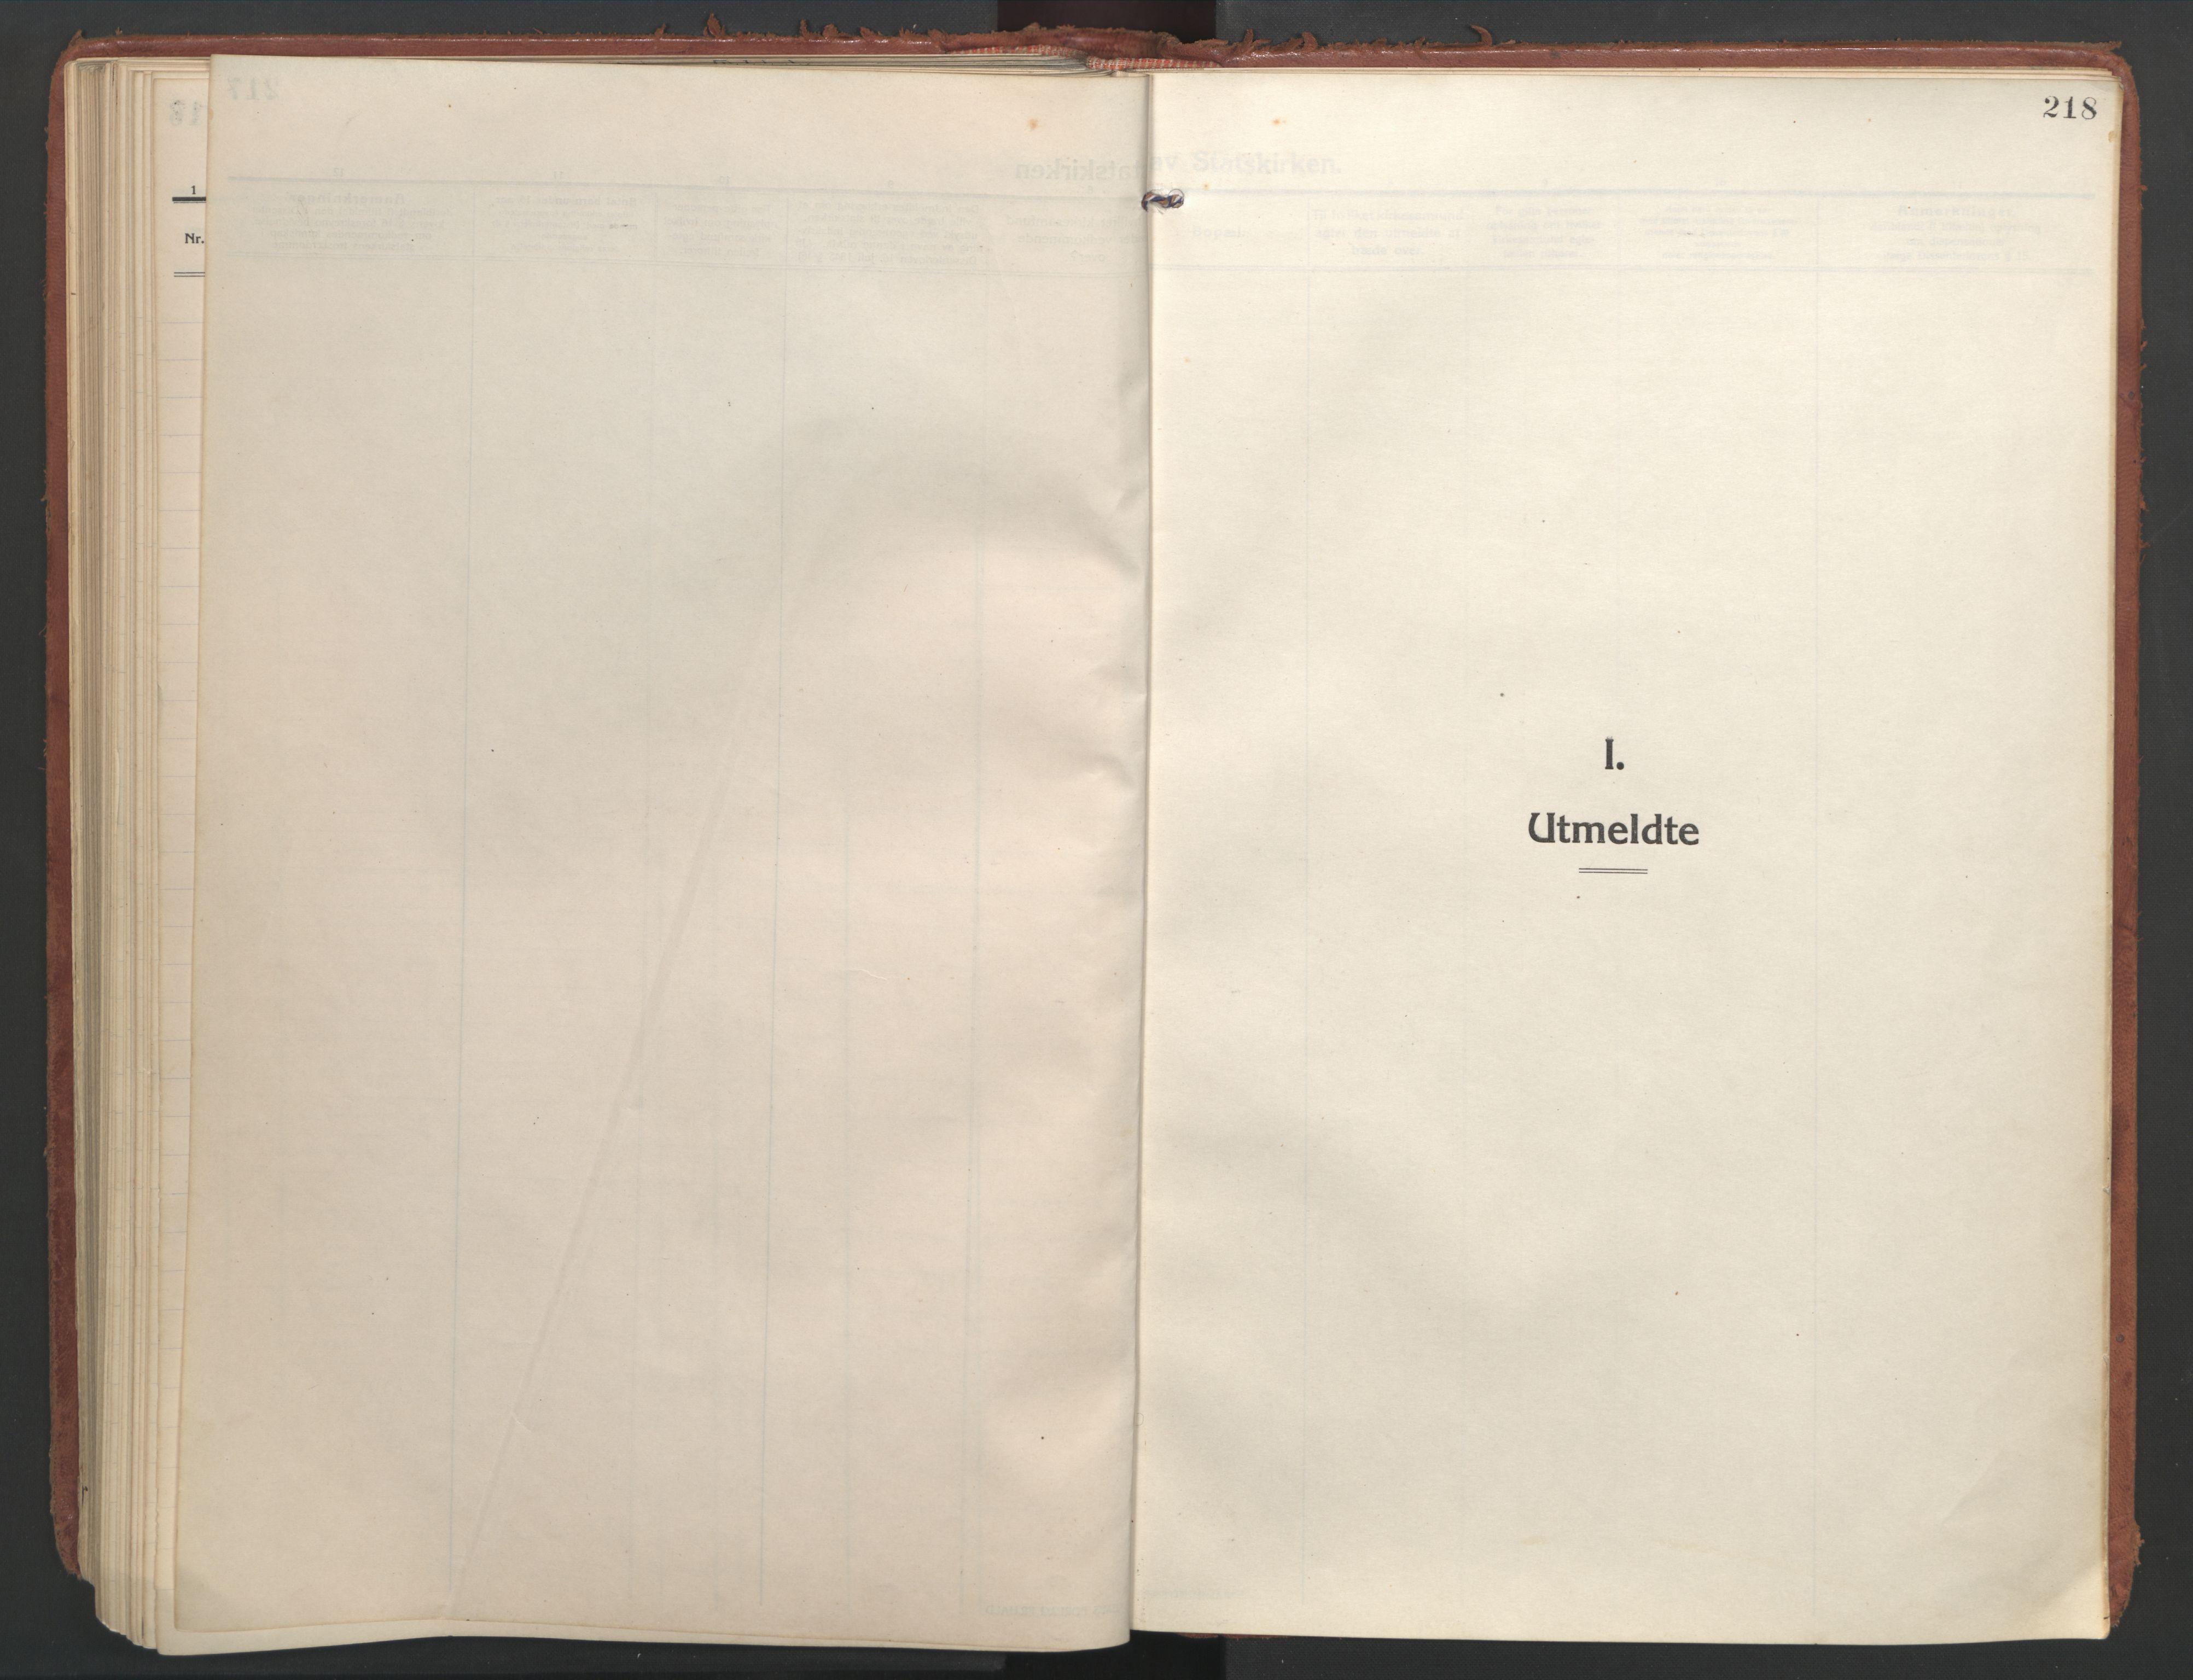 SAT, Ministerialprotokoller, klokkerbøker og fødselsregistre - Nordland, 804/L0086: Ministerialbok nr. 804A07, 1916-1935, s. 218